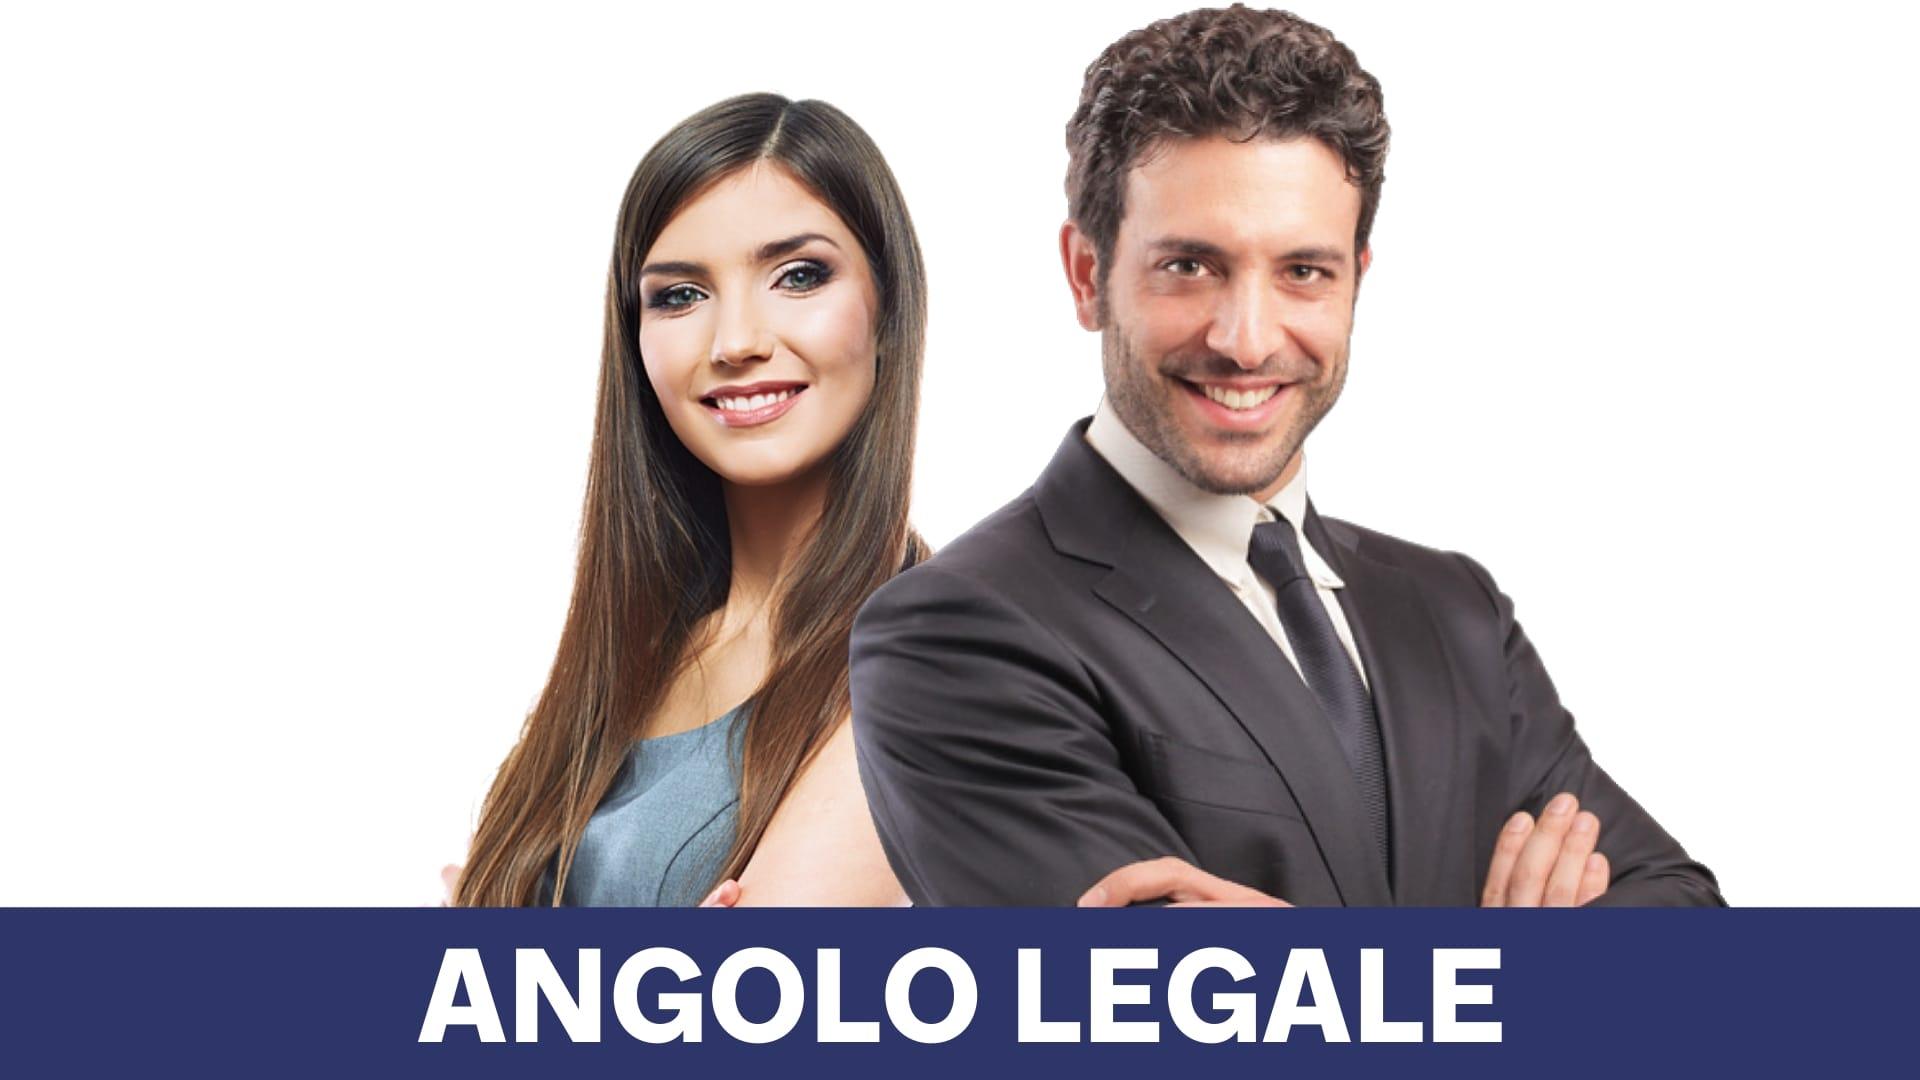 Angolo Legale FIAP  v4